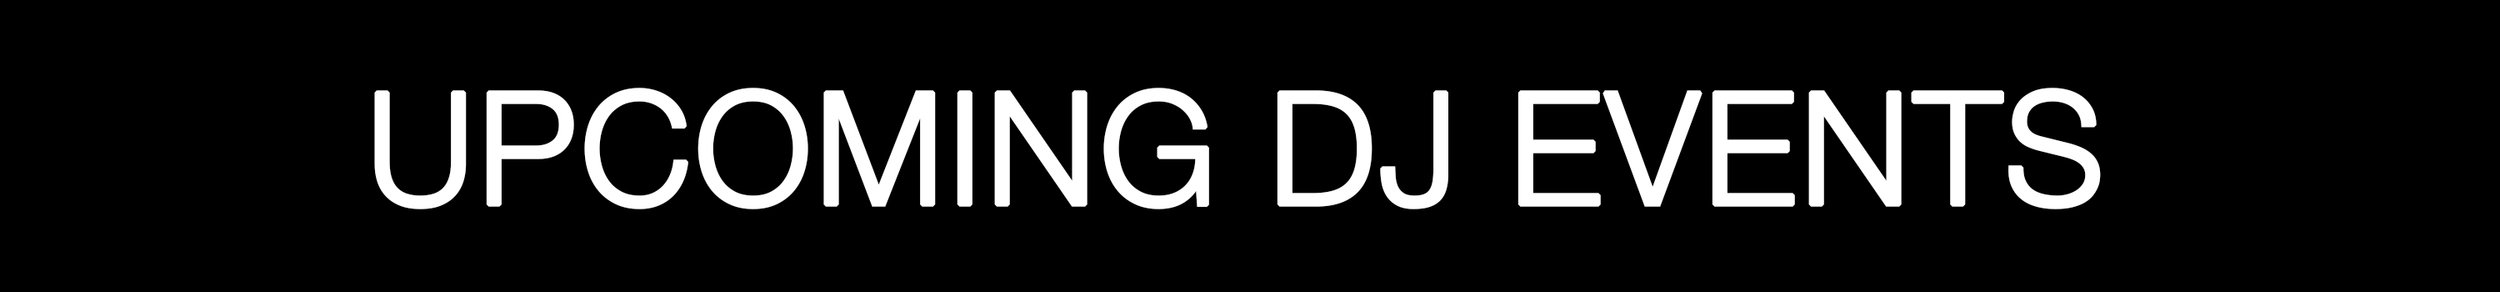 upcoming dj events copy.jpg